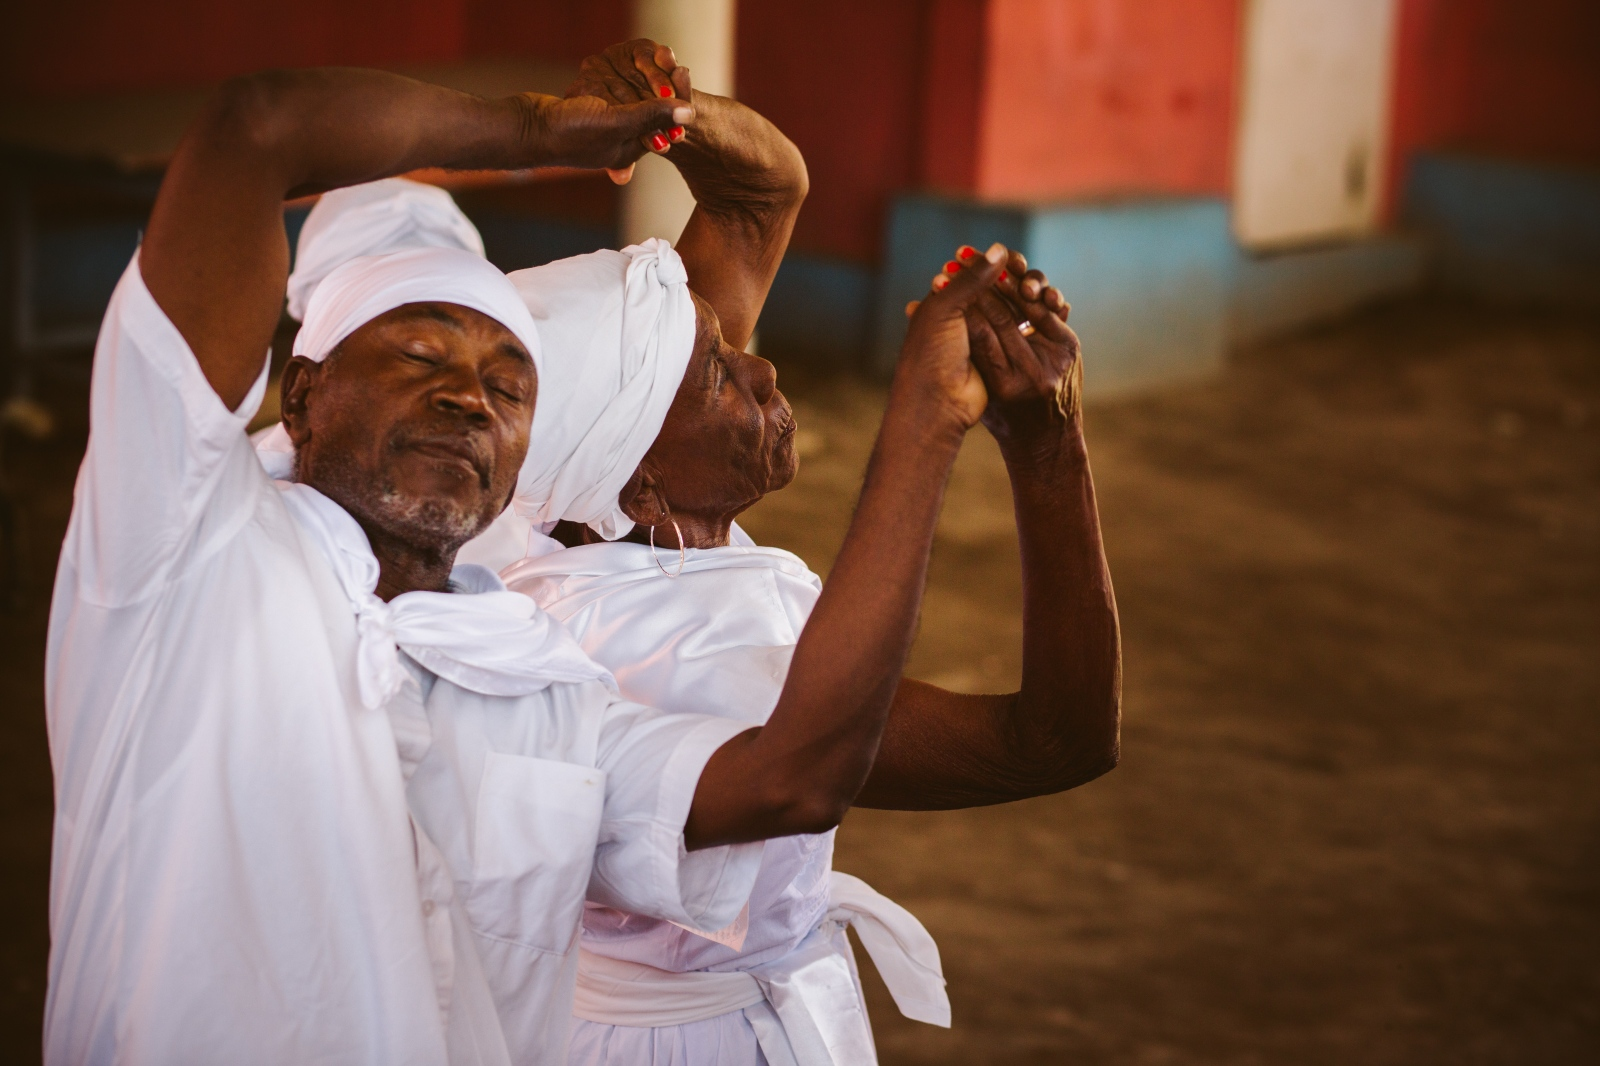 Art and Documentary Photography - Loading f__te_des_rois_vaudou_haiti-1.jpg